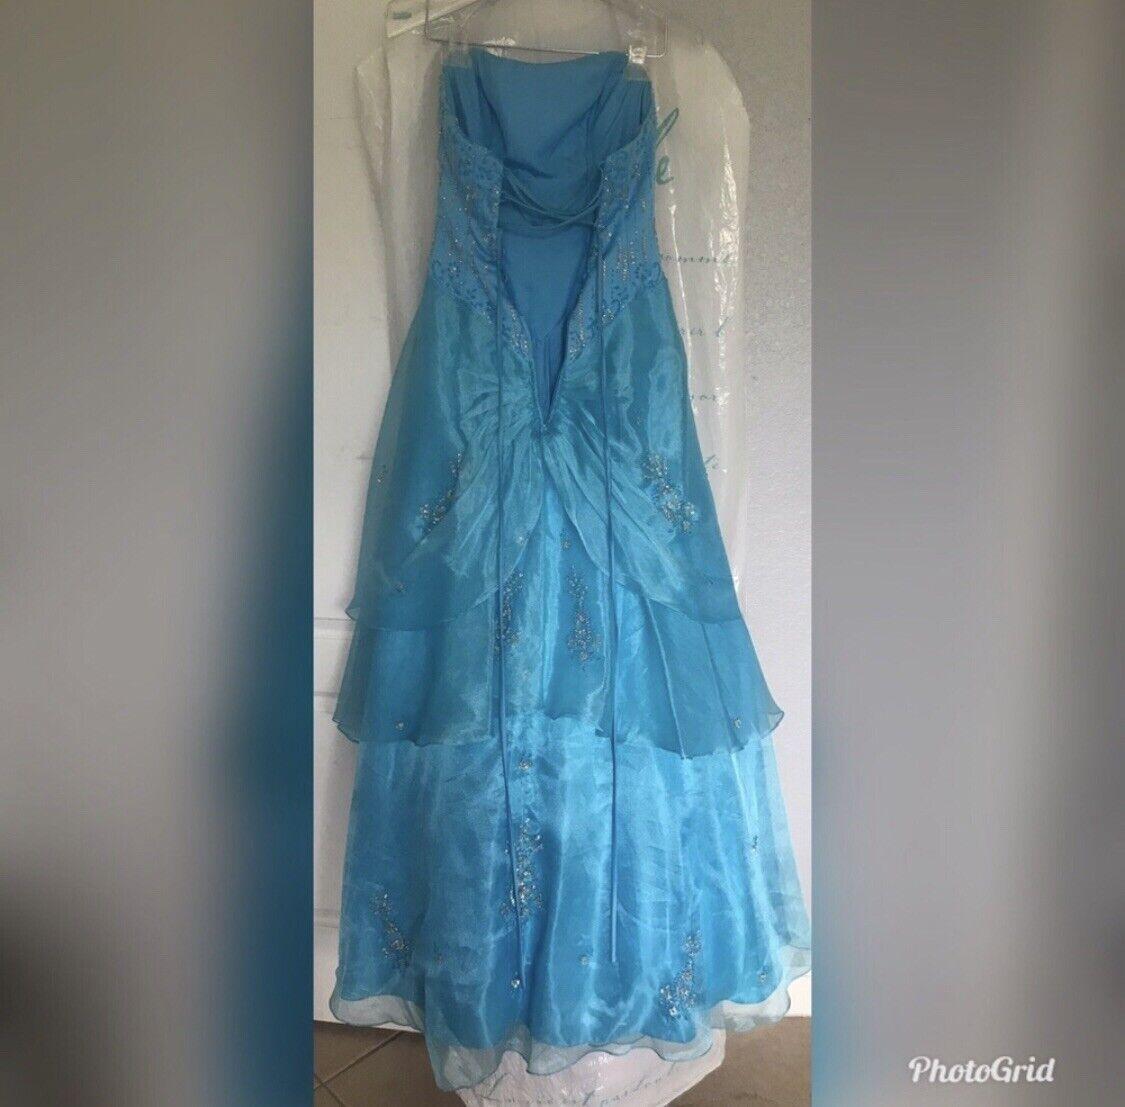 blue ball gown dress - image 2